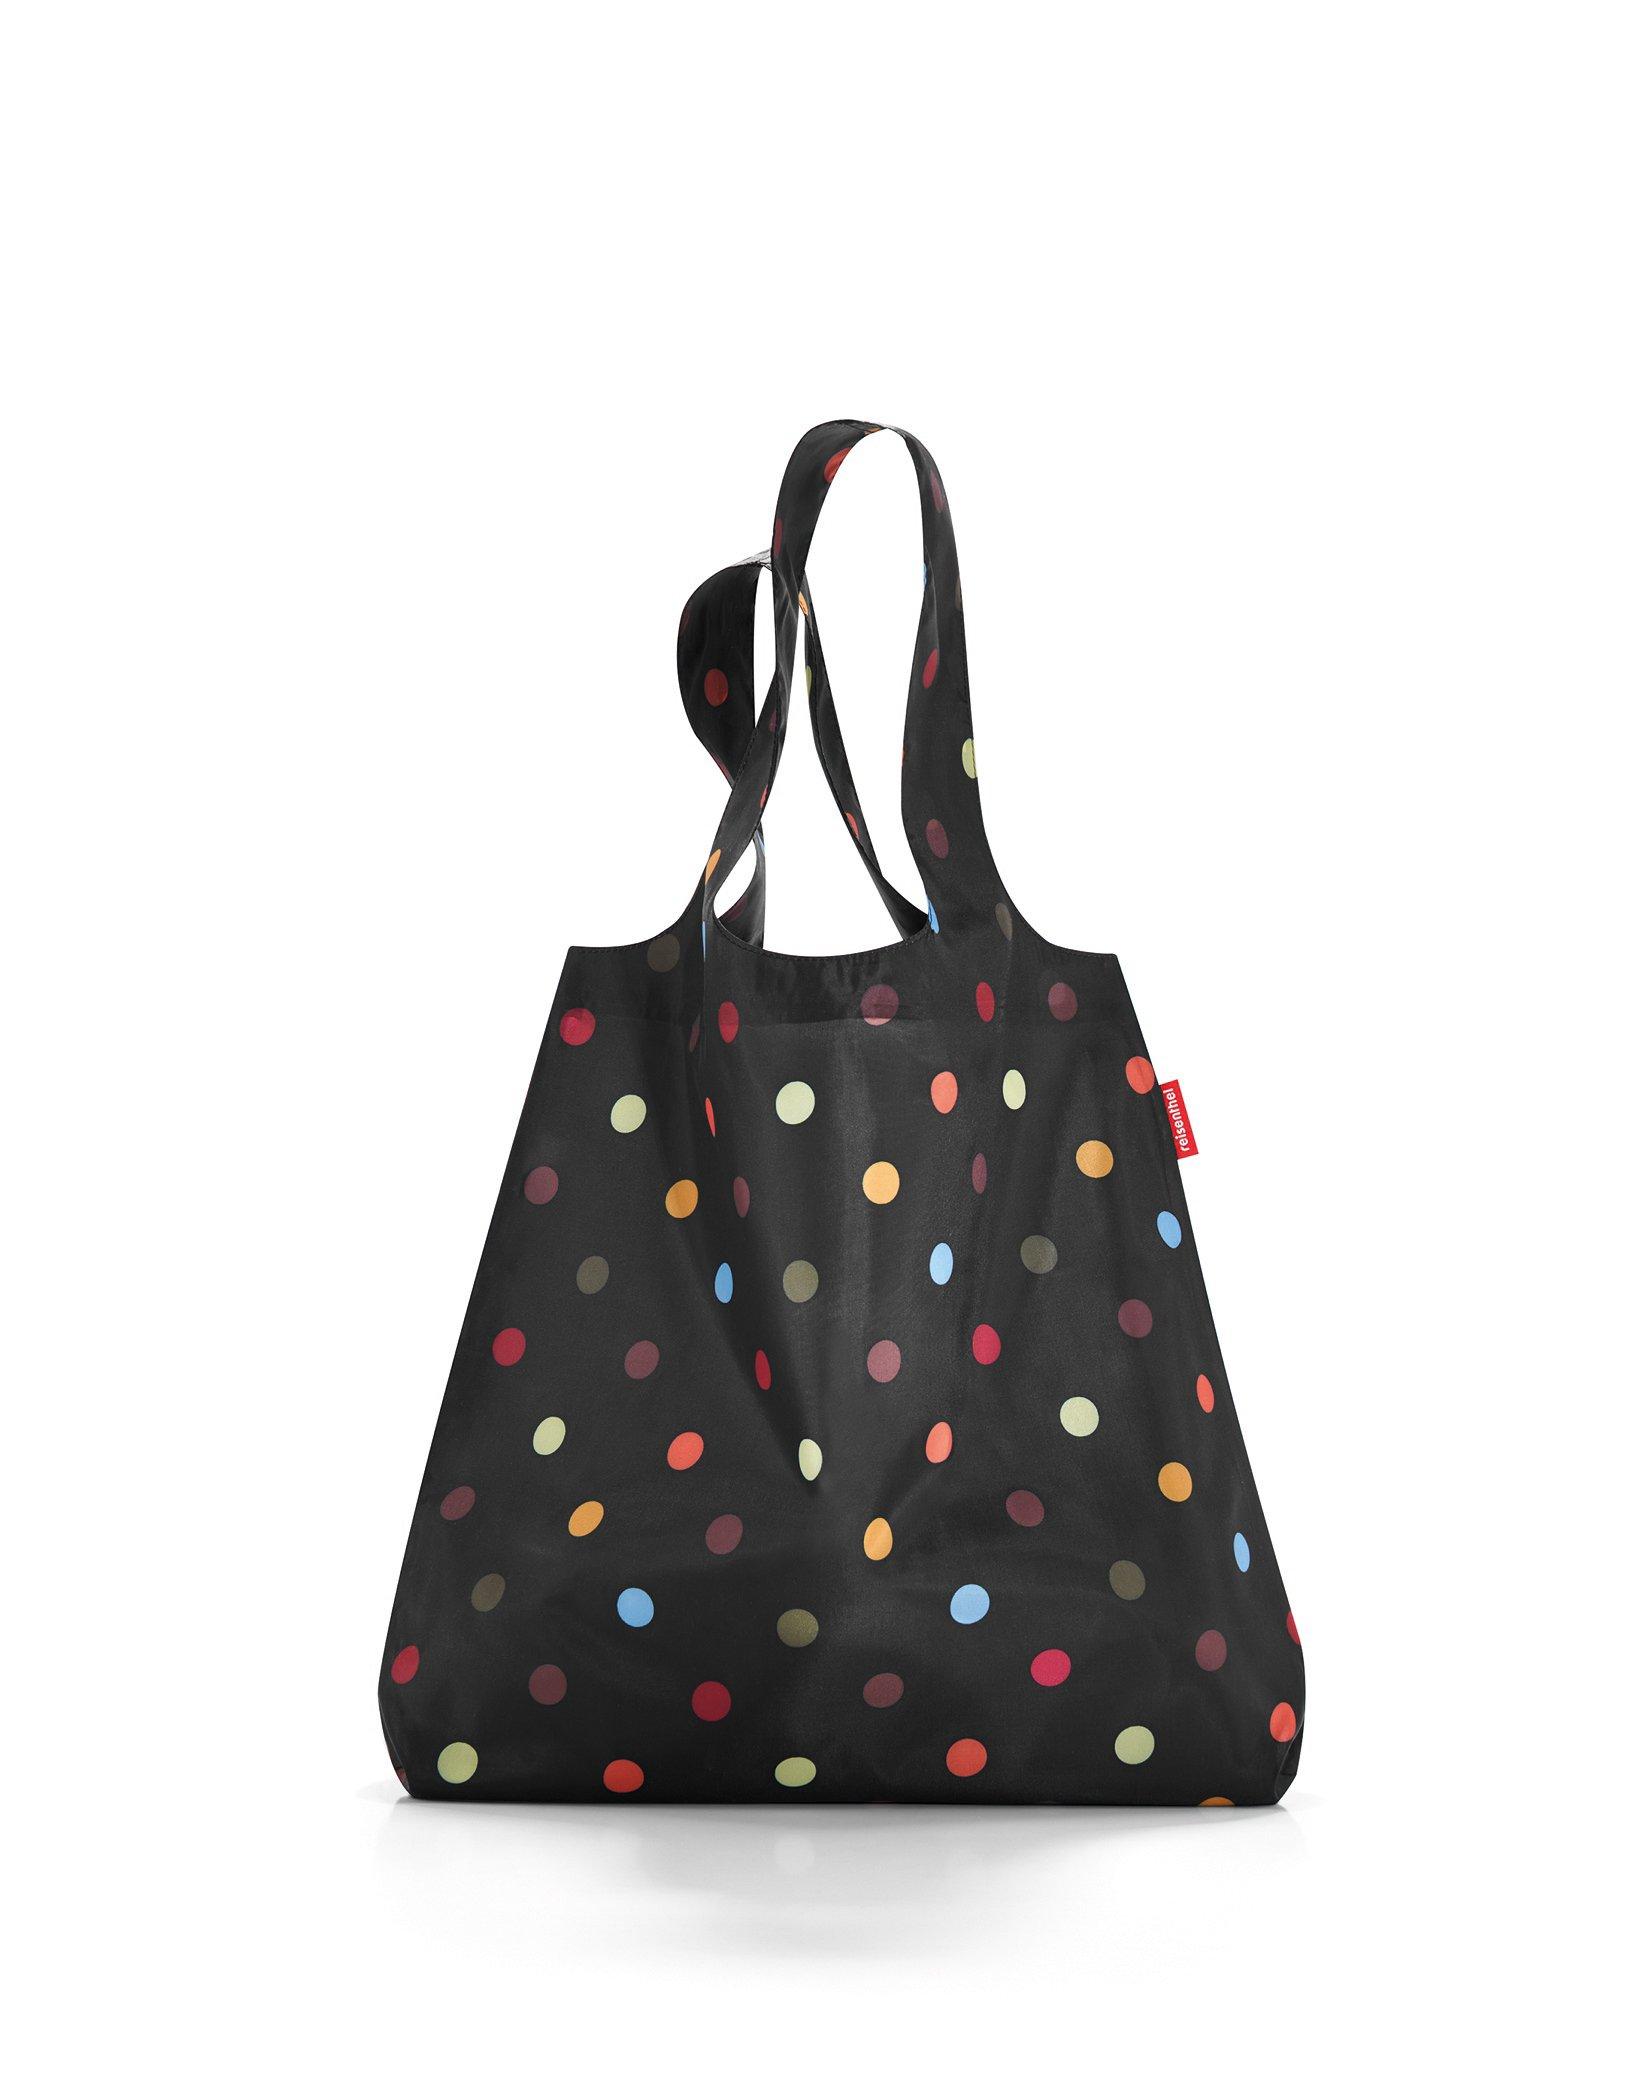 reisenthel Mini Maxi Shopper, Foldable Reusable Shopping Tote with Elastic Band, Dots